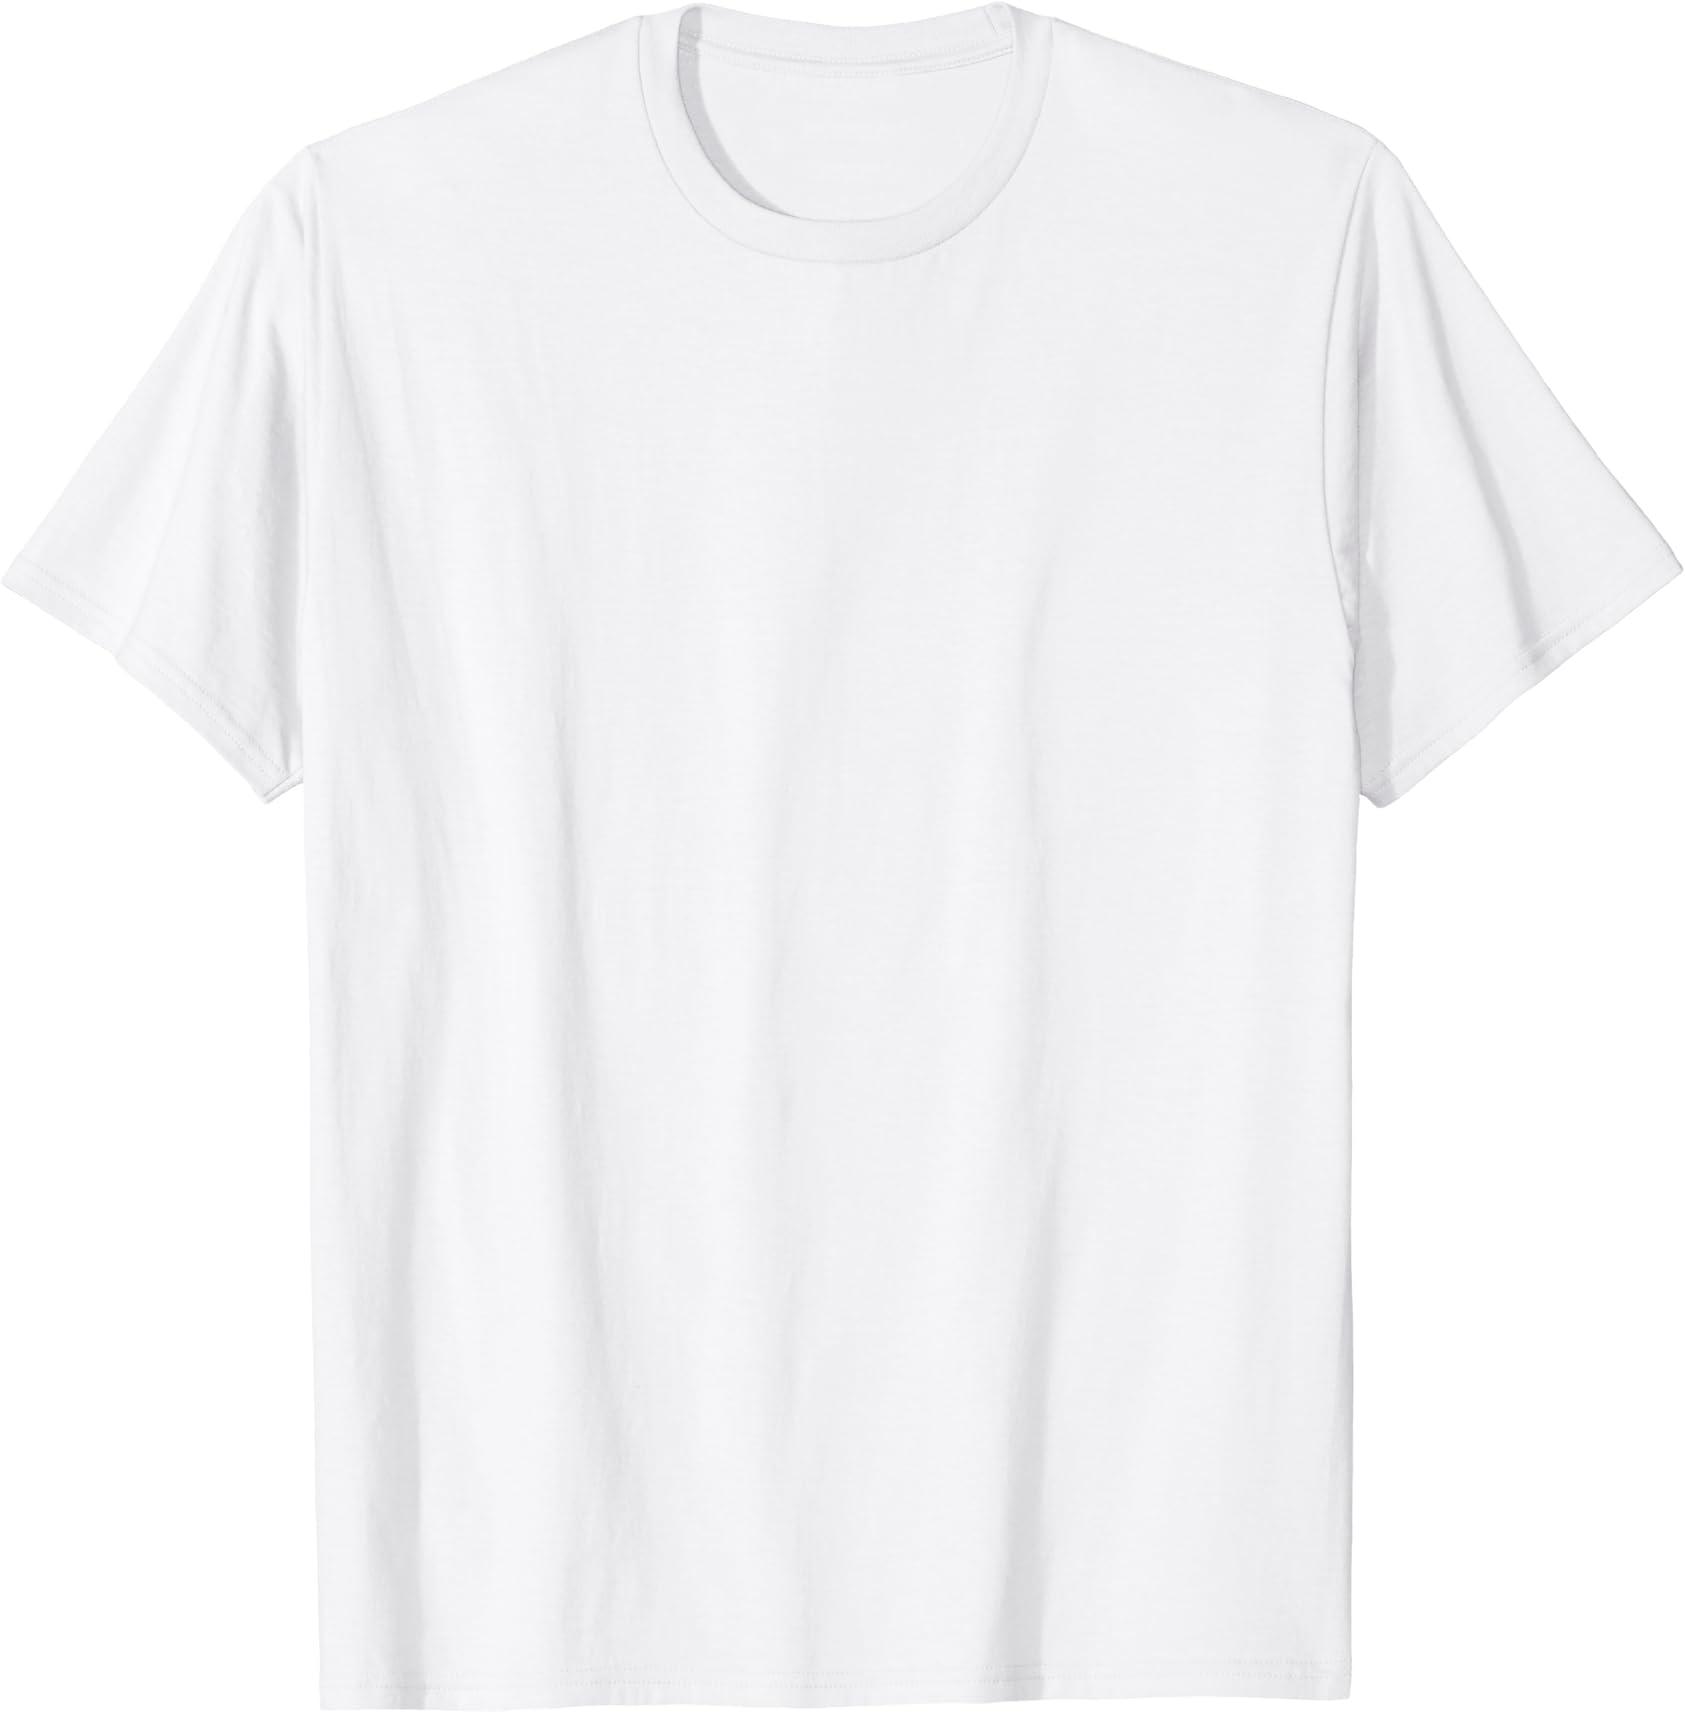 West Ham Choose Life T-Shirt Mens